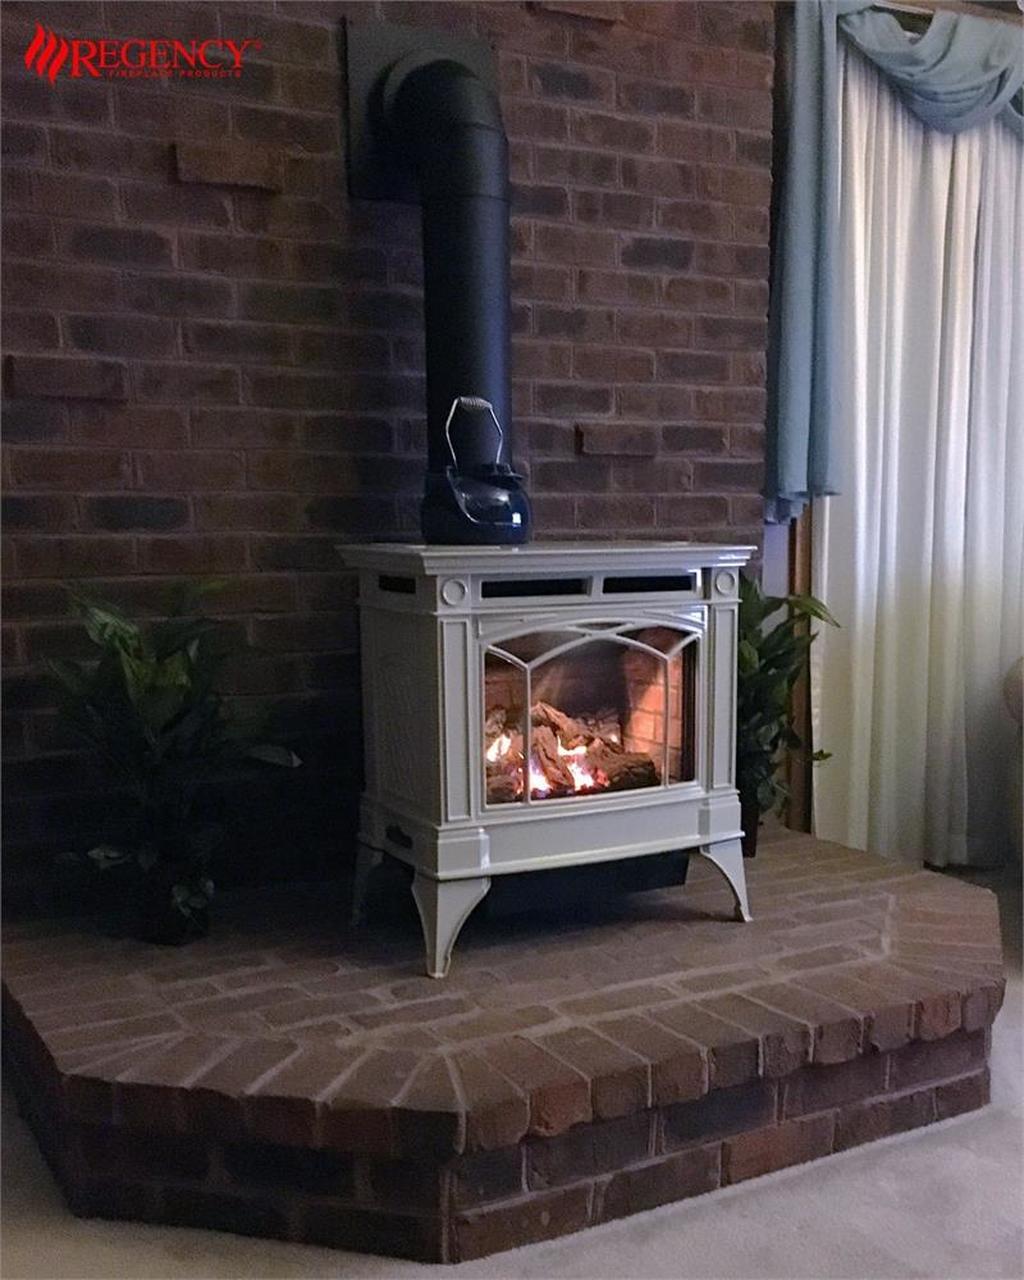 regency h35 large gas stove